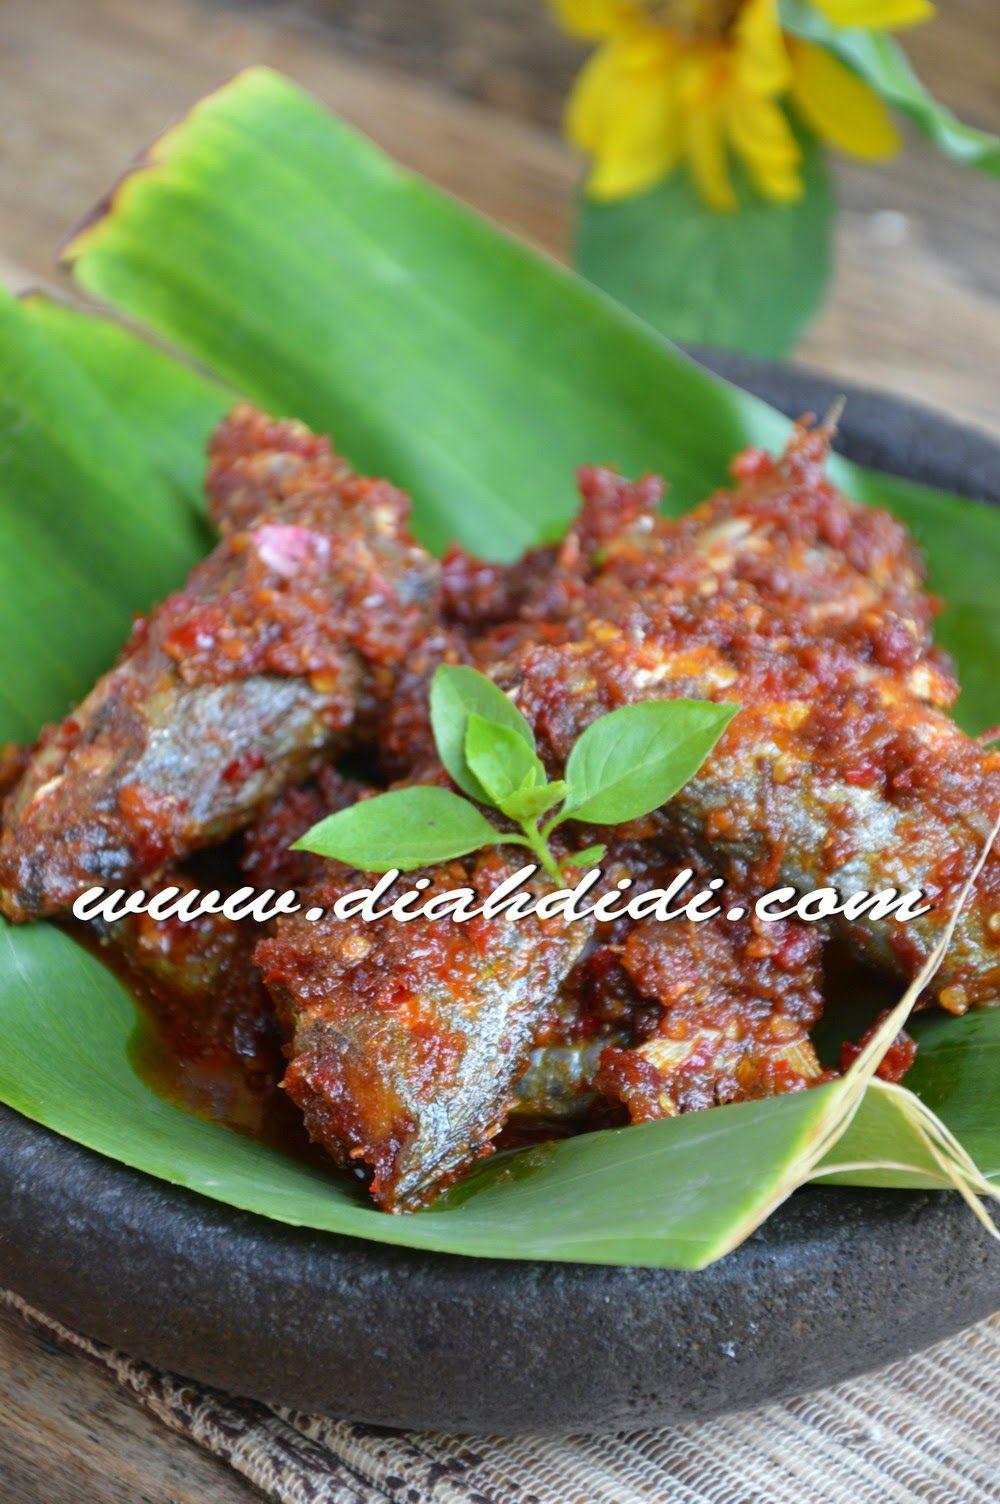 Brokoli Crispi Ikan Bumbu Kecap Pedas Resep Masakan Resep Masakan Indonesia Makanan Enak